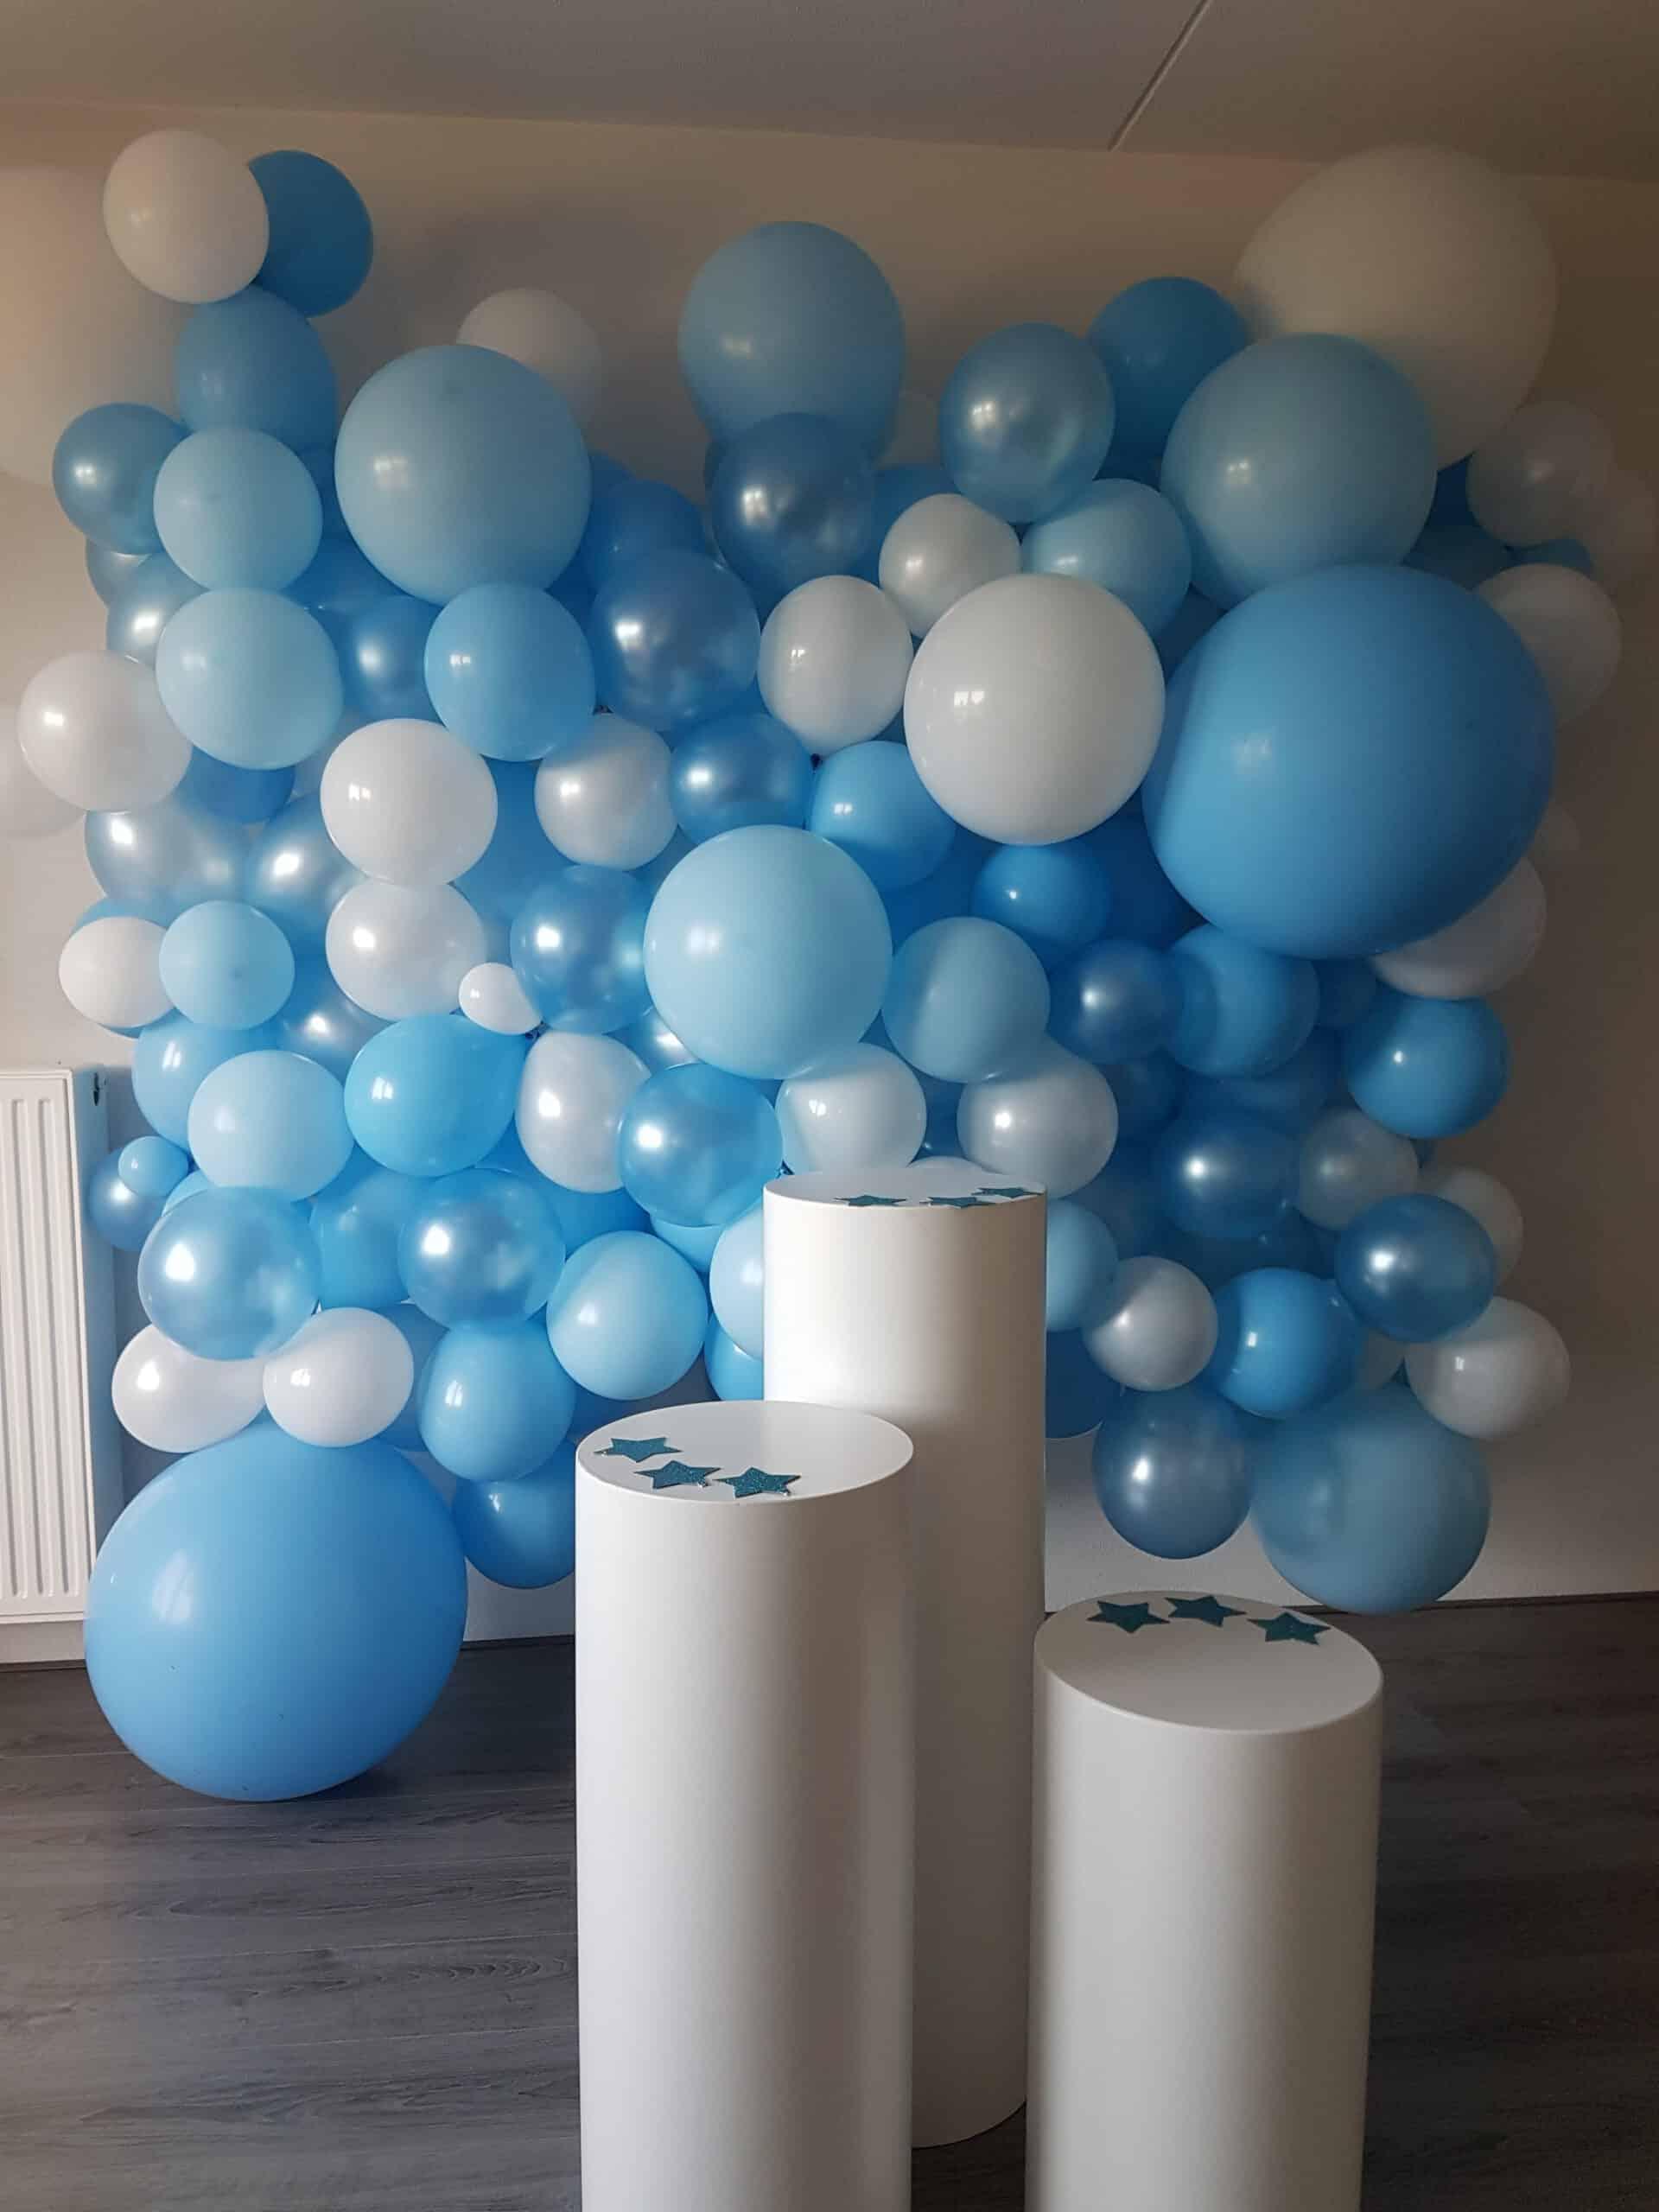 20190921 112934 scaled - Organic ballondecoratie van allerlei maten ballonnen